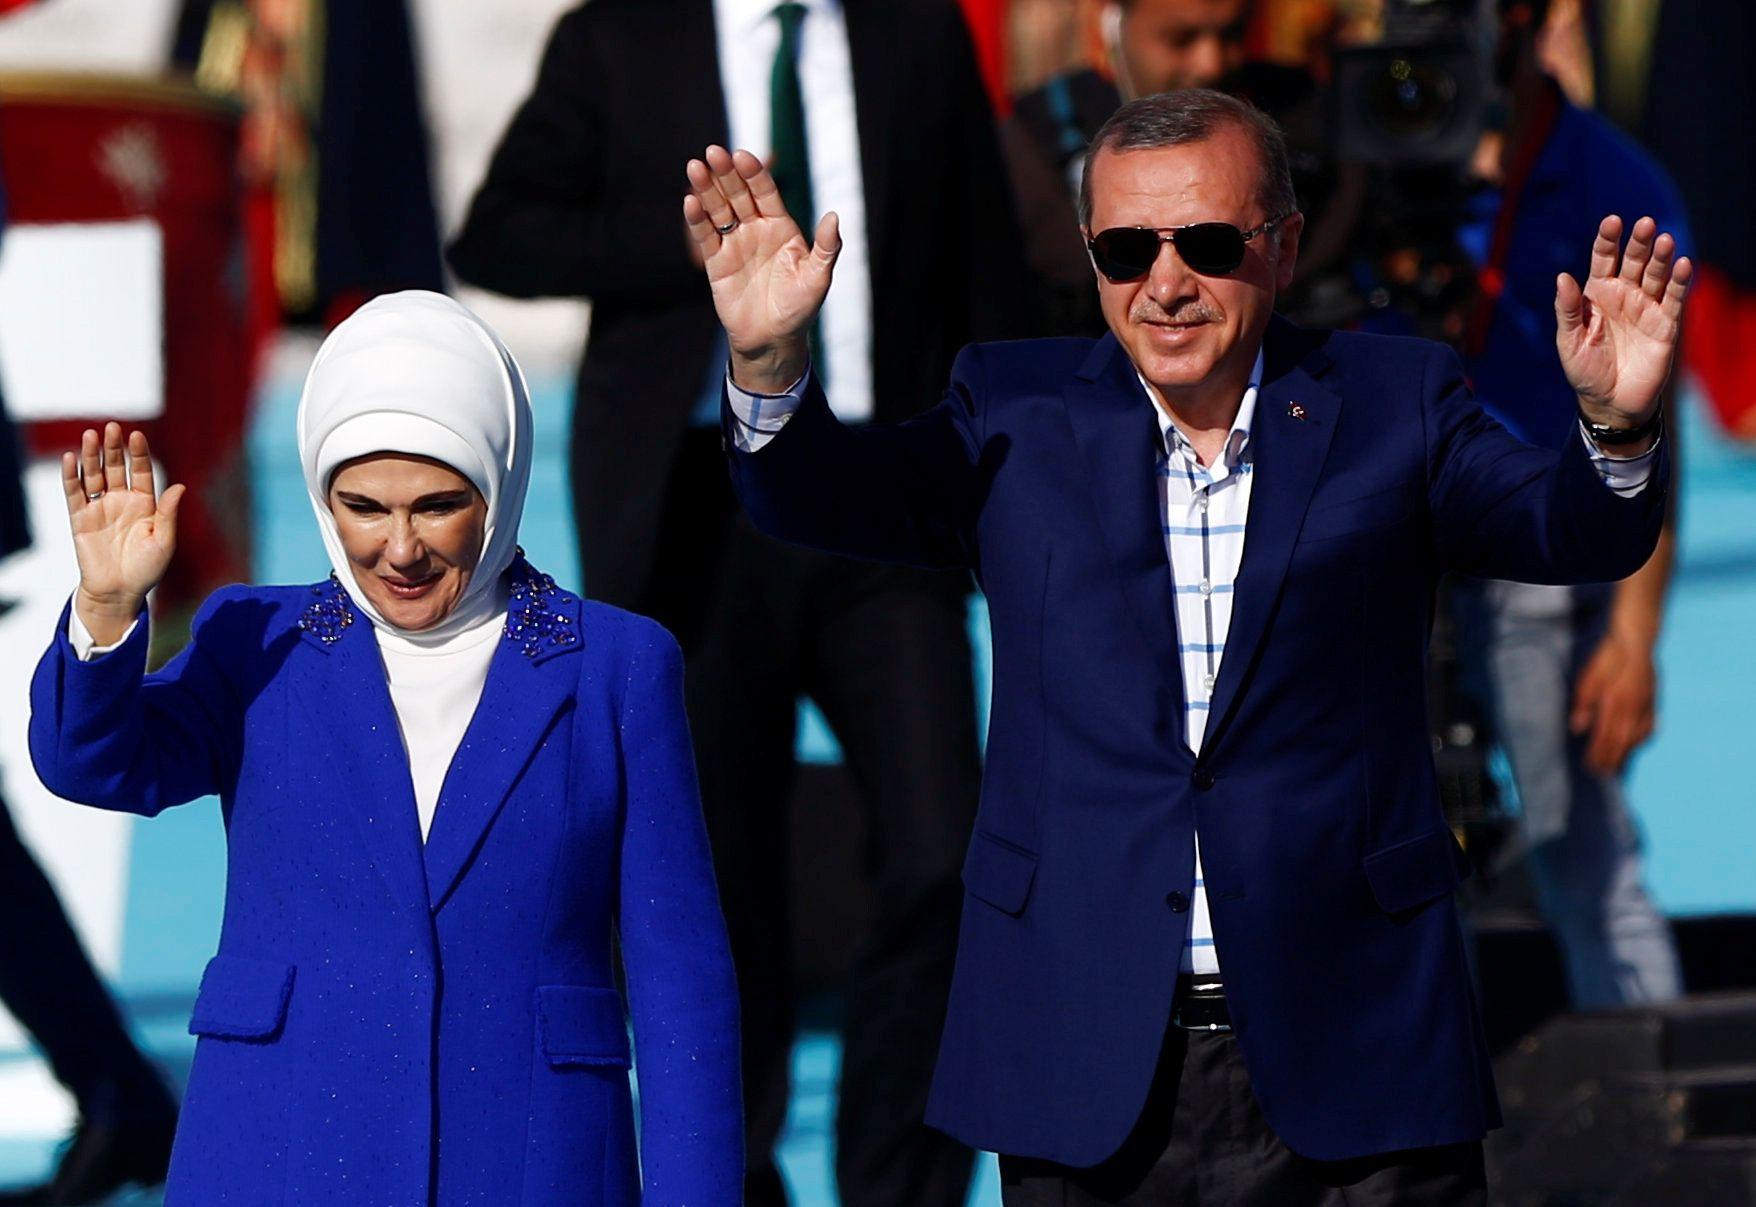 Turkeys Erdogan Dines With Transgender Icon After Lgbt Rally Bust Up